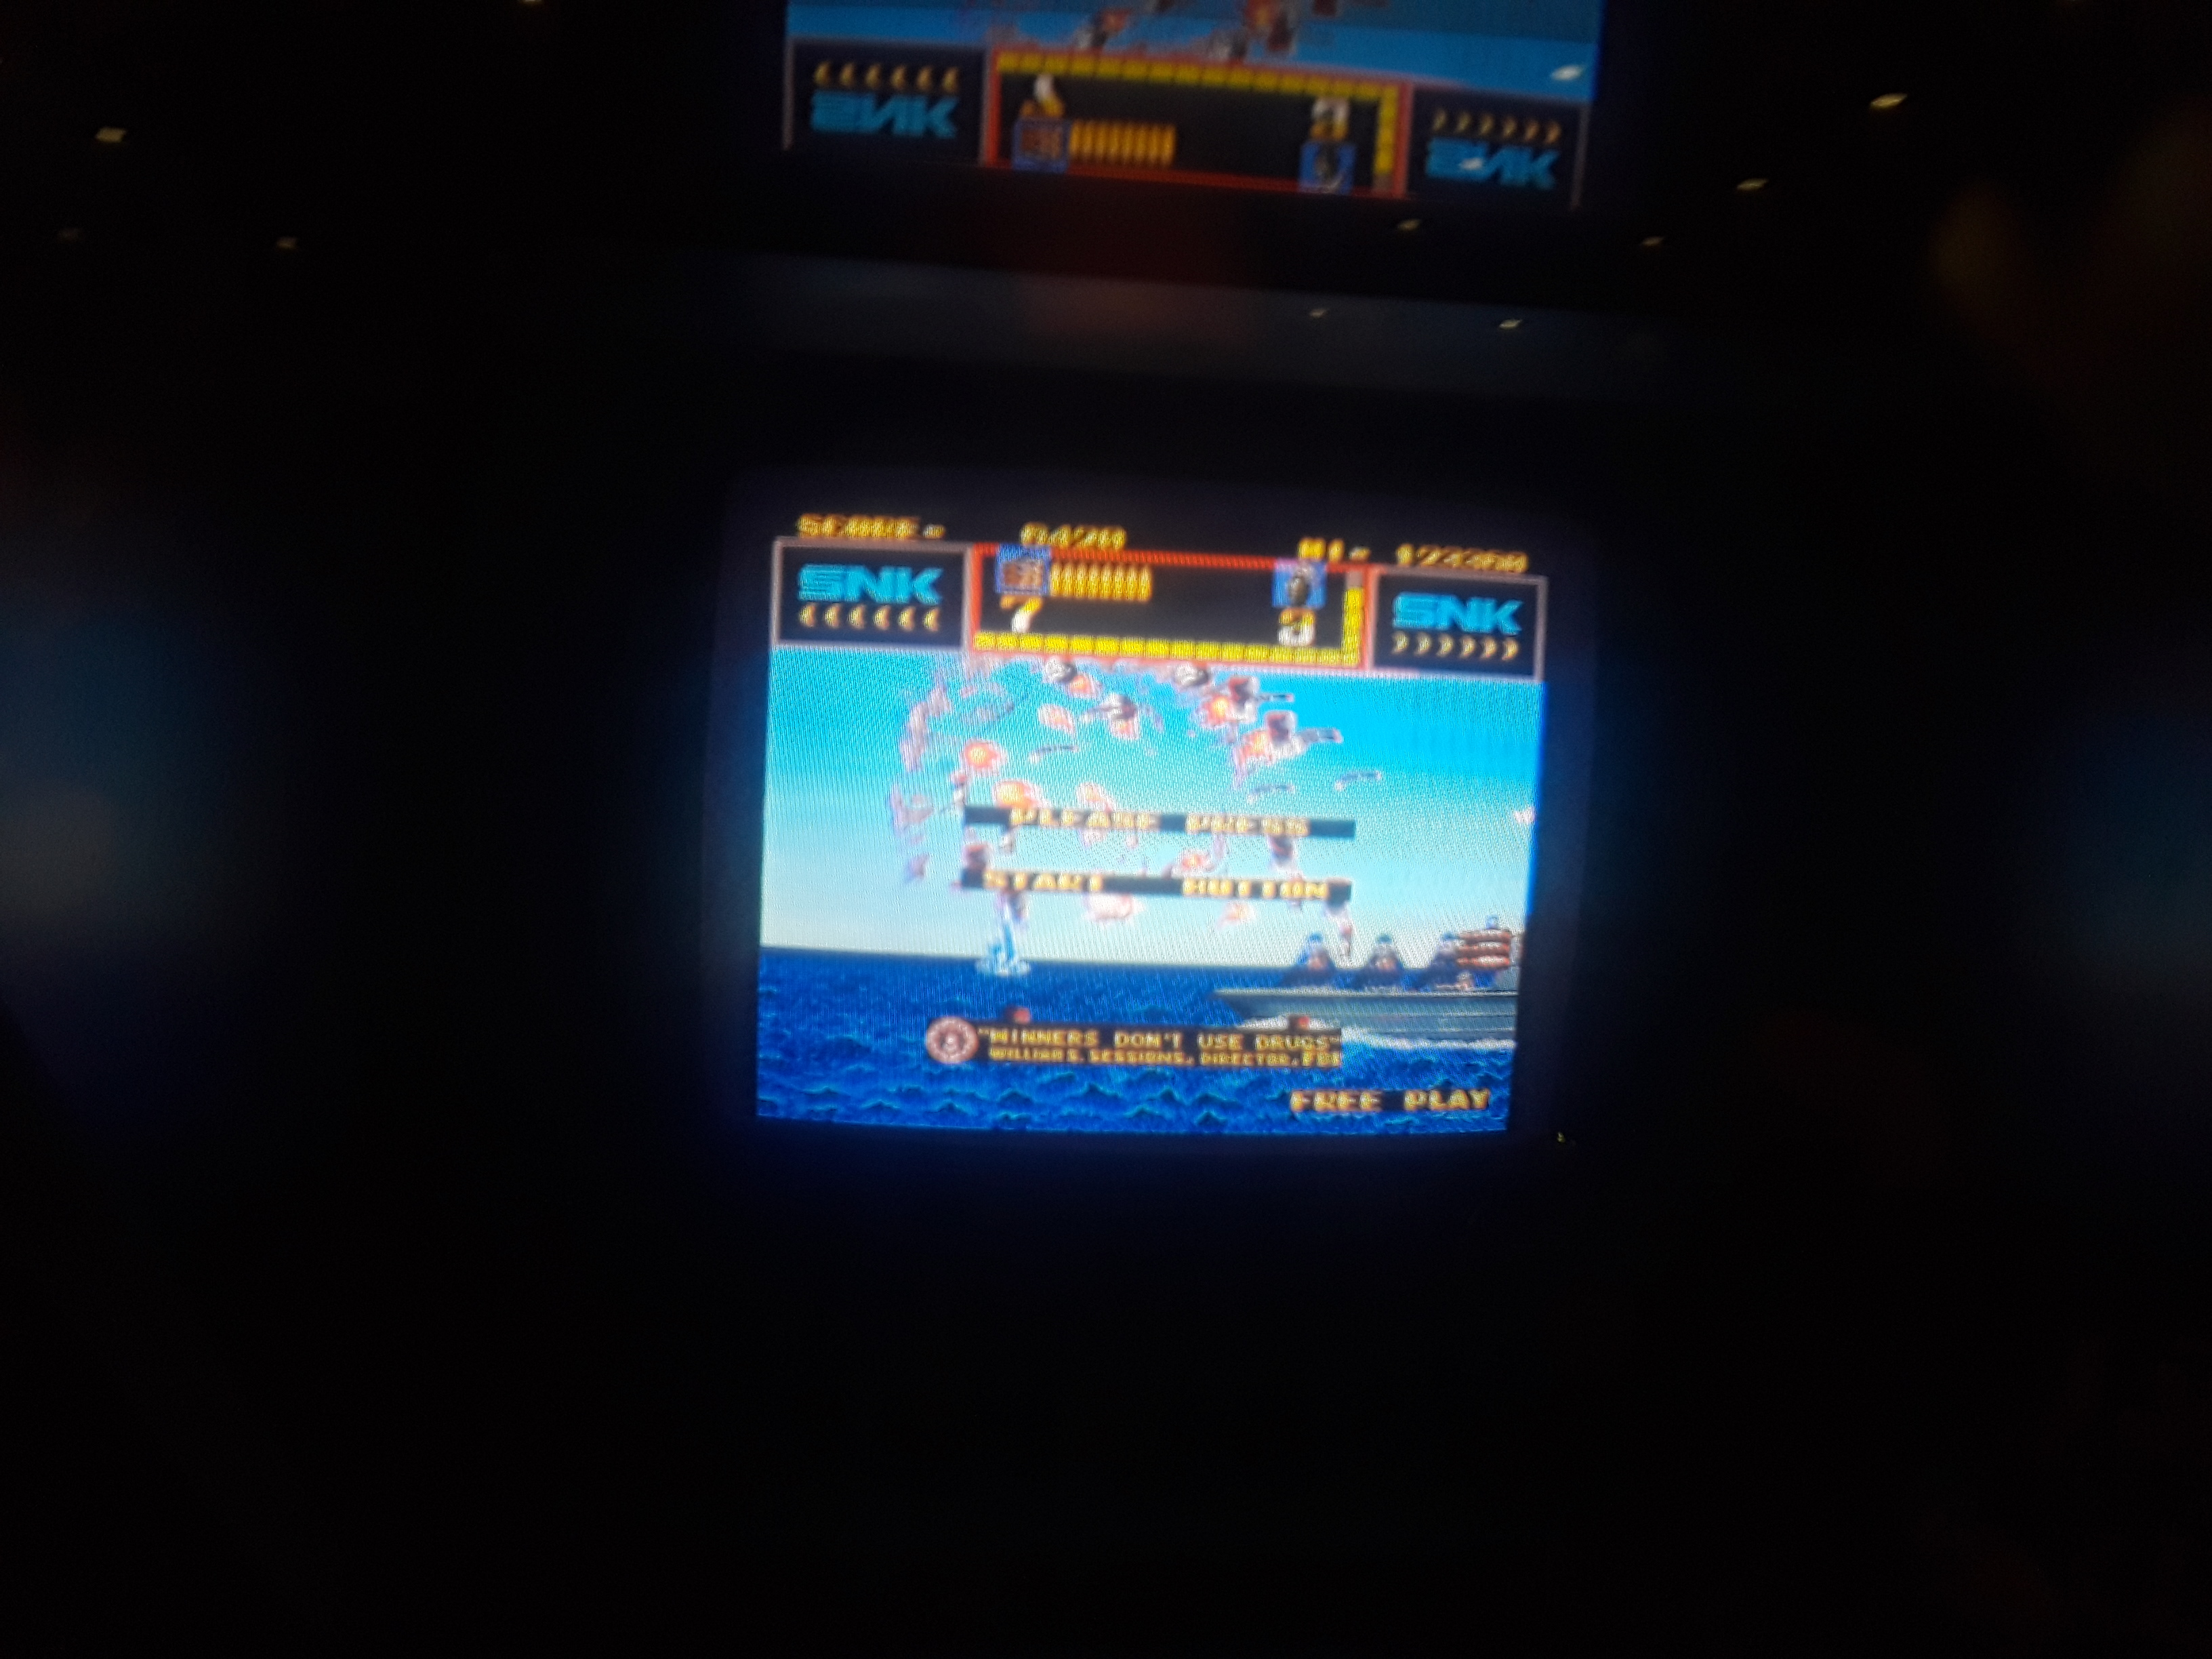 JML101582: Mechanized Attack (Arcade) 6,420 points on 2019-06-01 15:02:14